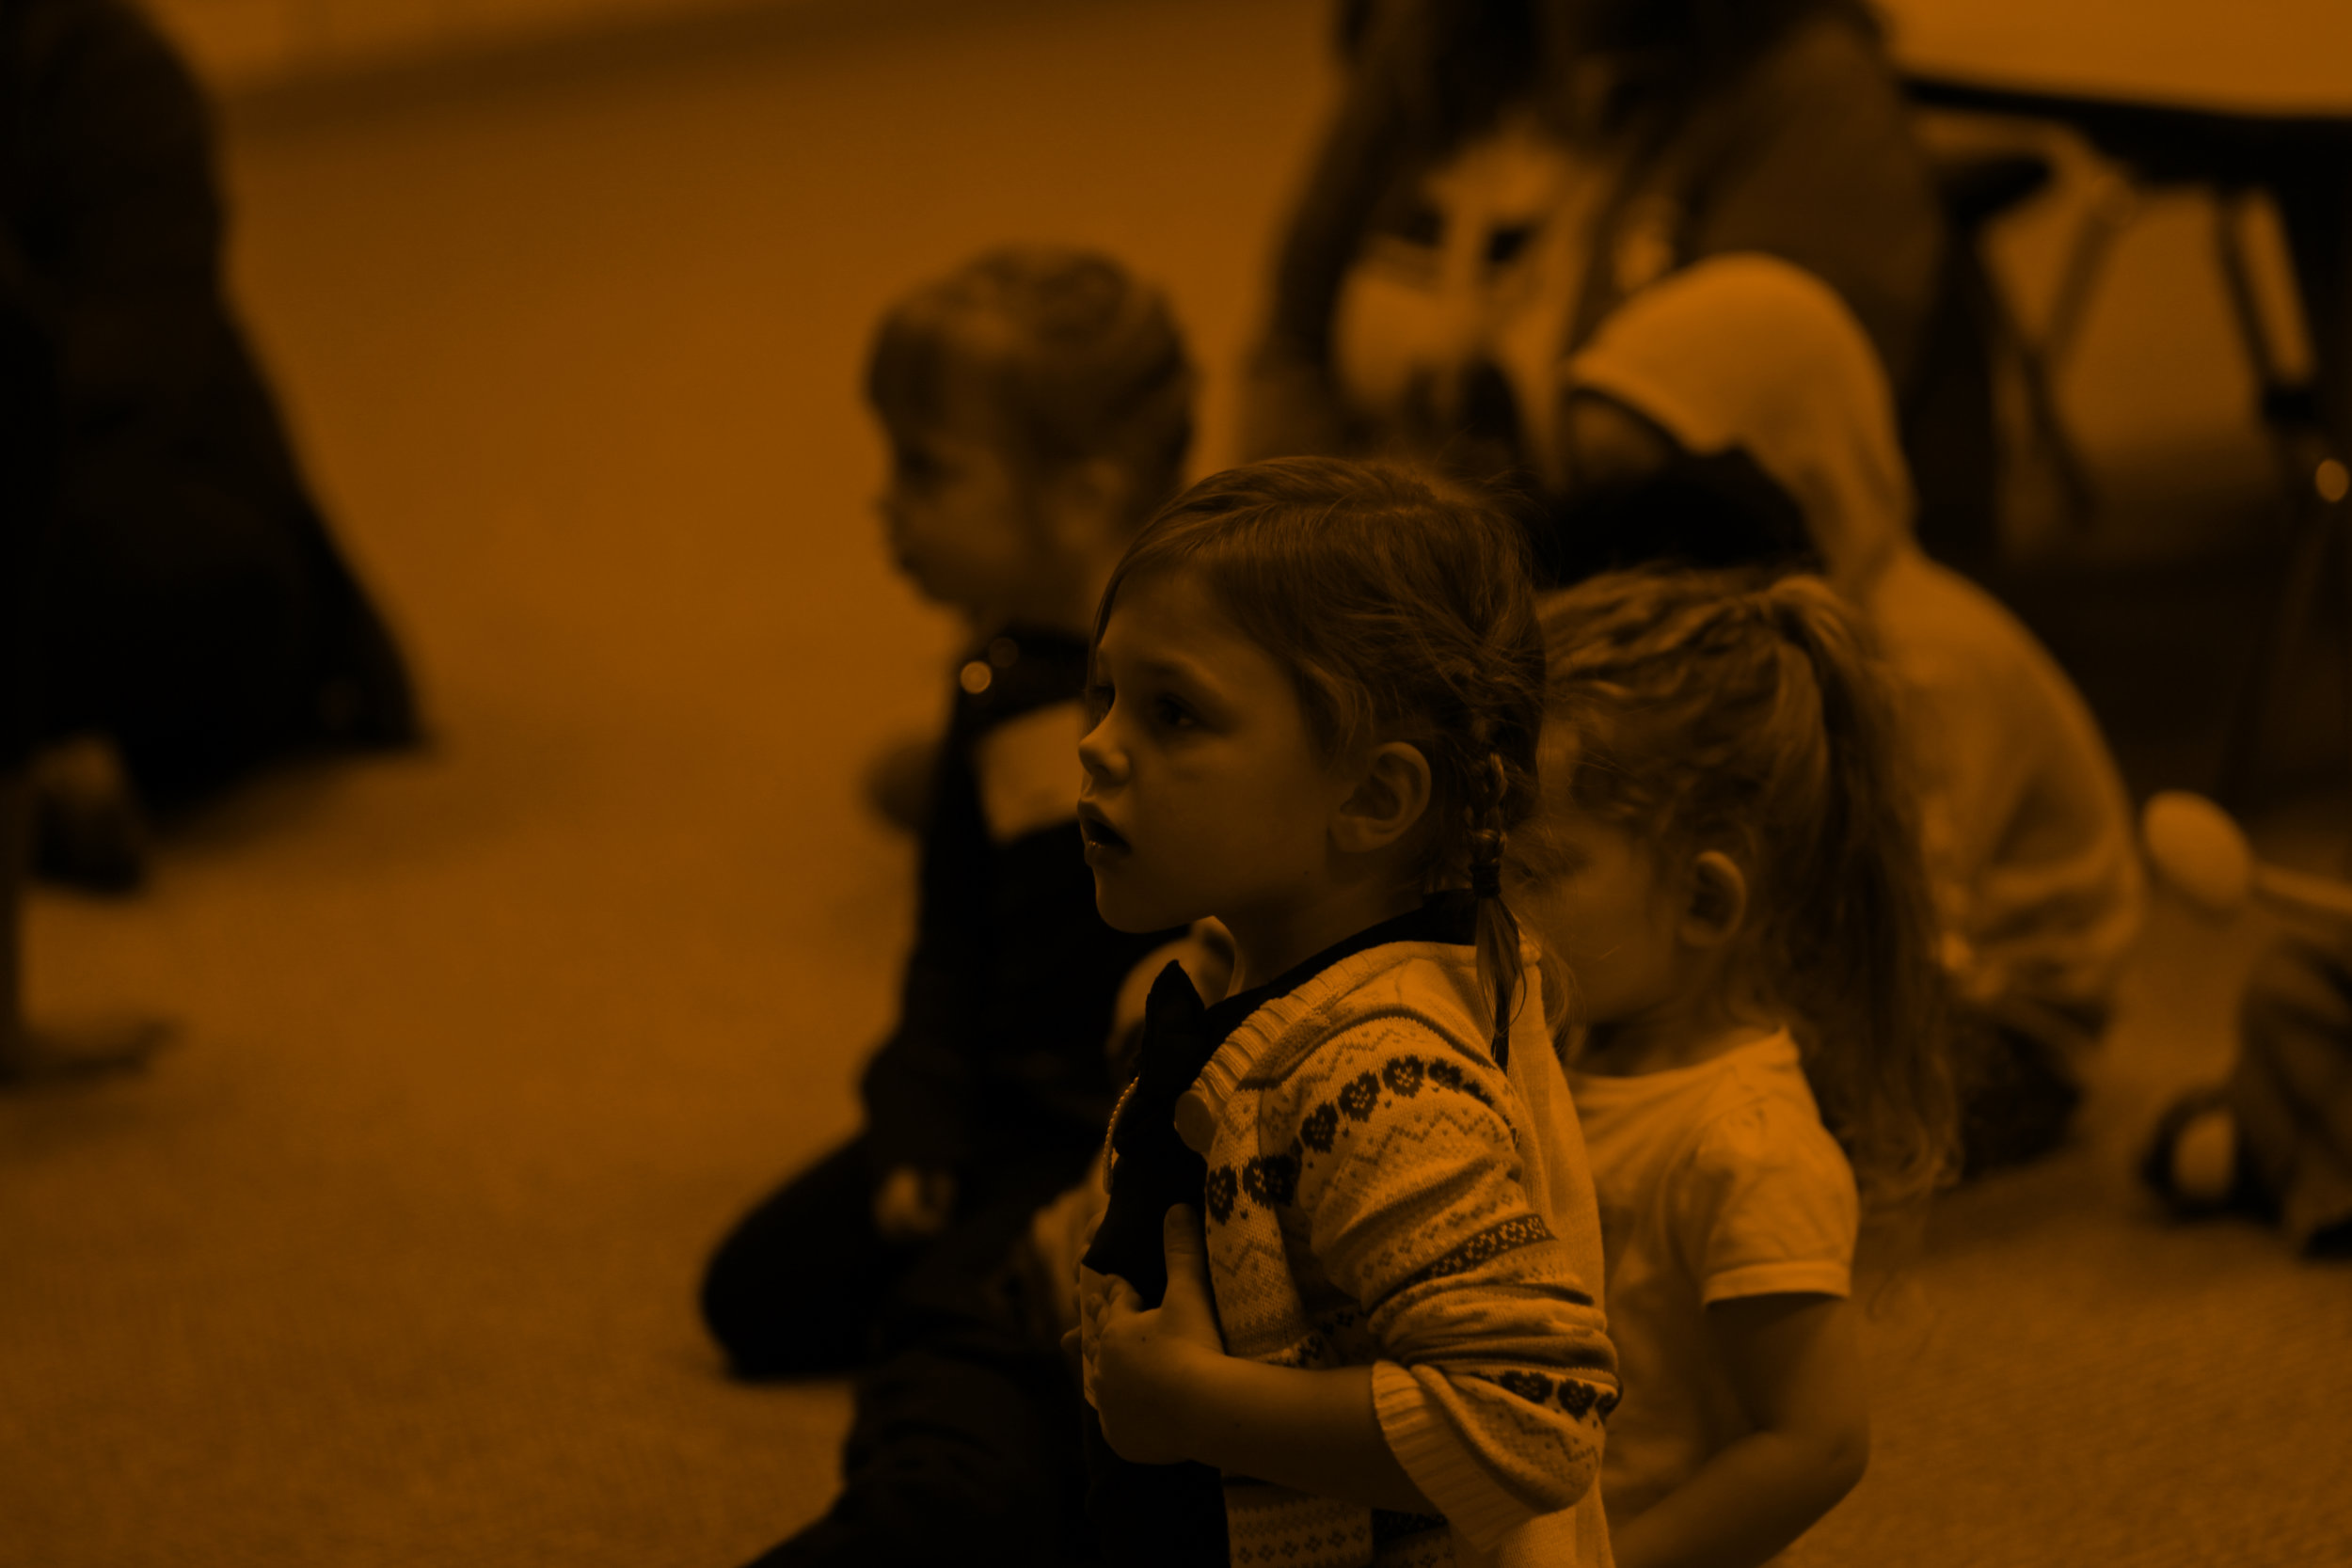 DANVILLE CAMPUS - Service: 10 a.m. | Infants–5th grade21589 DMC HWY 79 Danville, IA | (319) 237-8400 ext. 101Coordinator: Sarah Esslinger